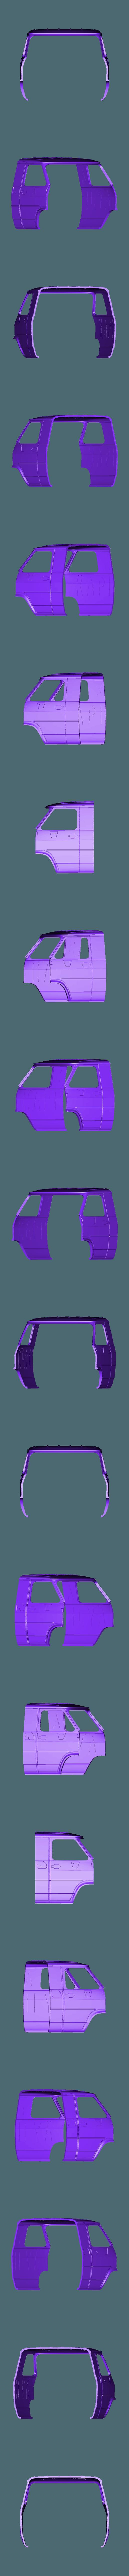 CentrFront.stl Descargar archivo STL CHEVY VAN G20 RC BODY SCALER AXIAL MST TRX4 RC4WD • Modelo para imprimir en 3D, ilyakapitonov